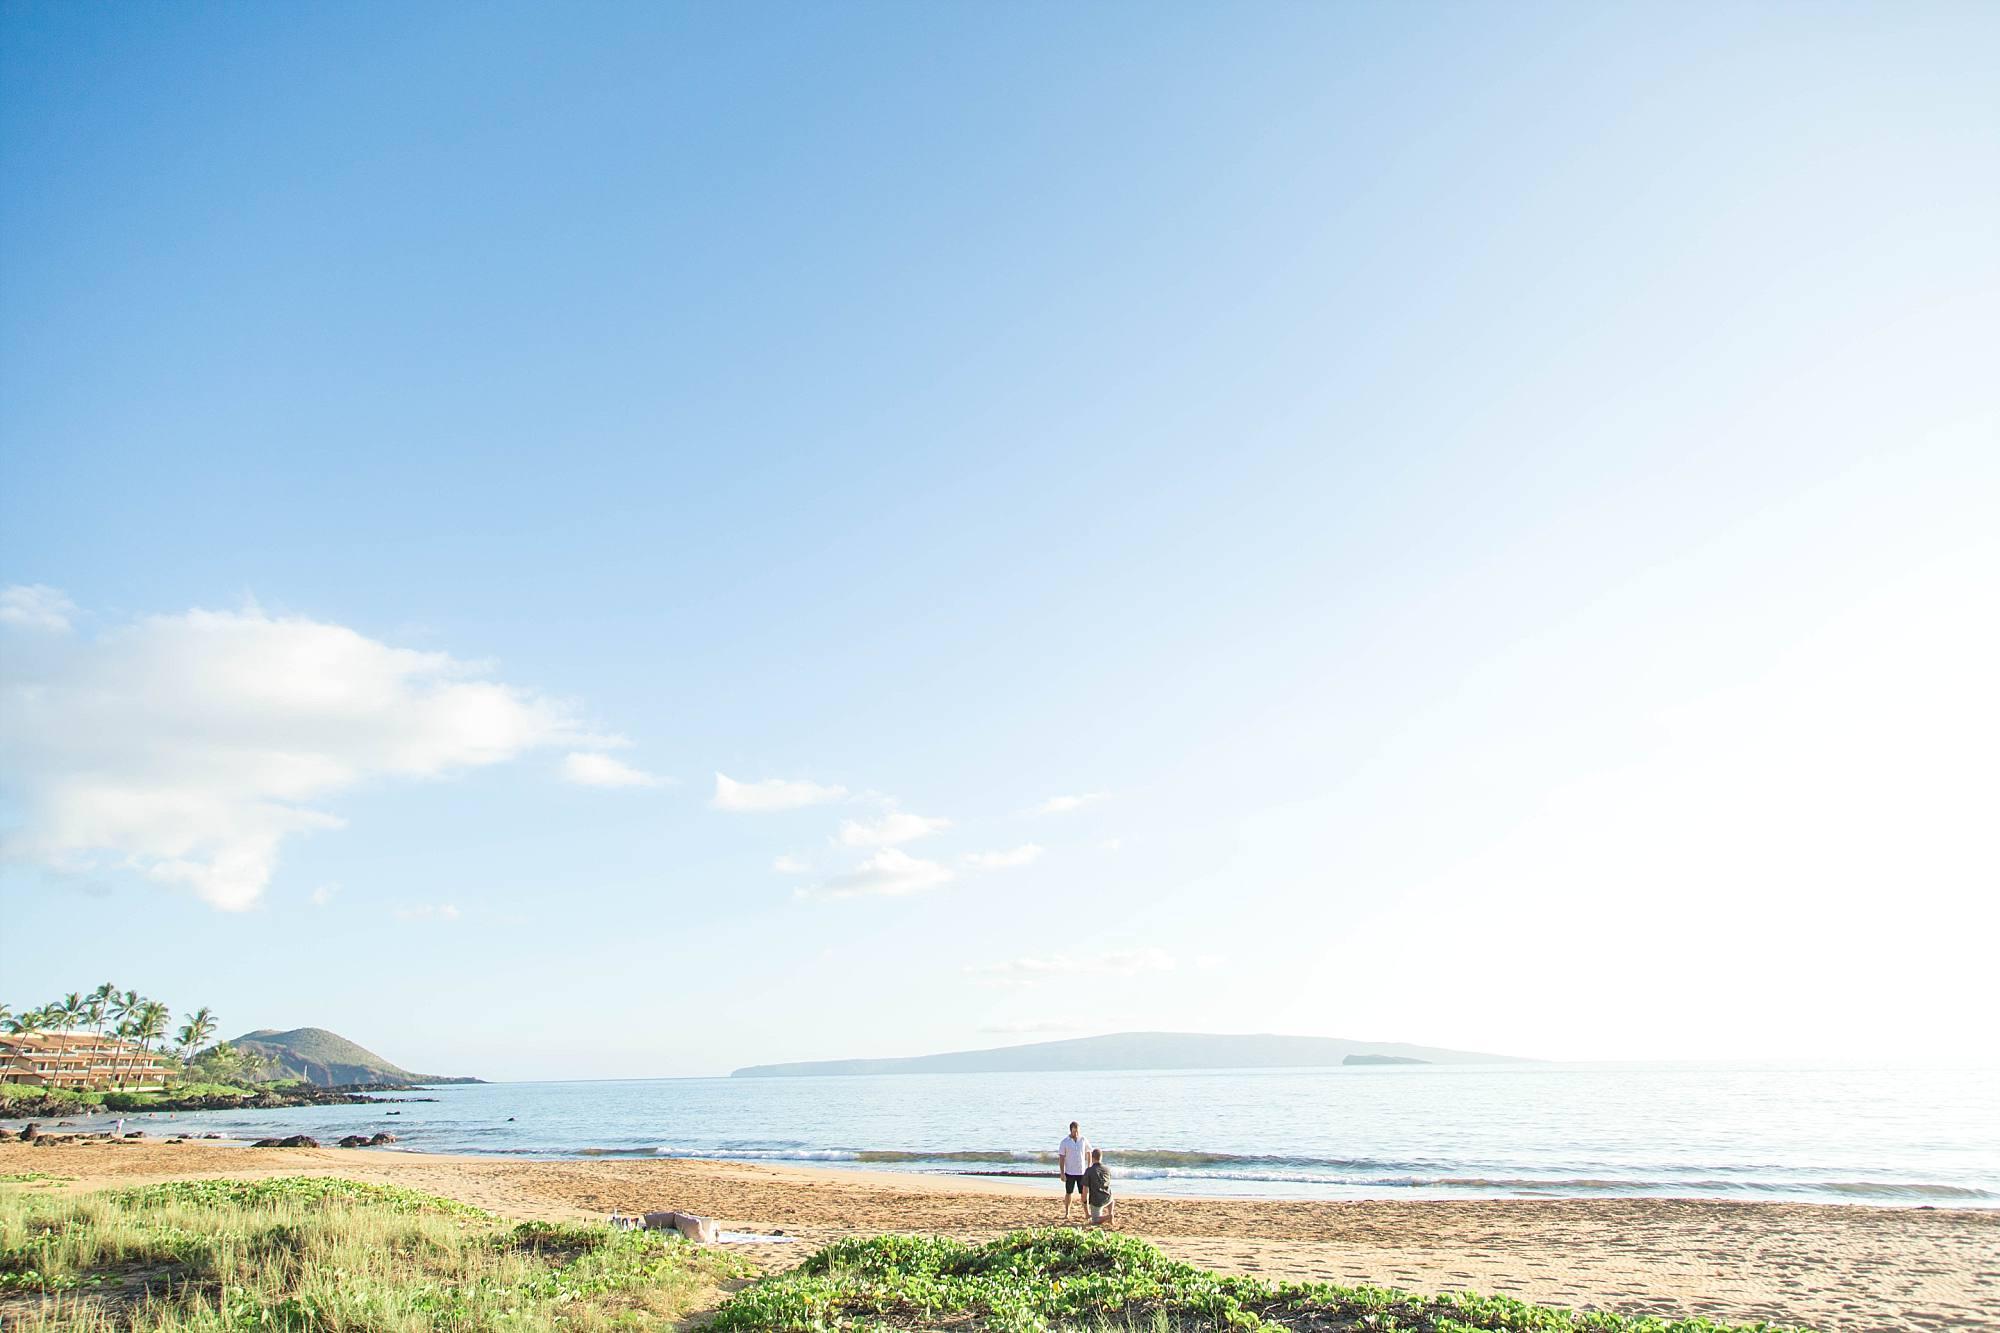 proposal on Maui, Kahoolawe in the distance, at a beautiful South Maui beach